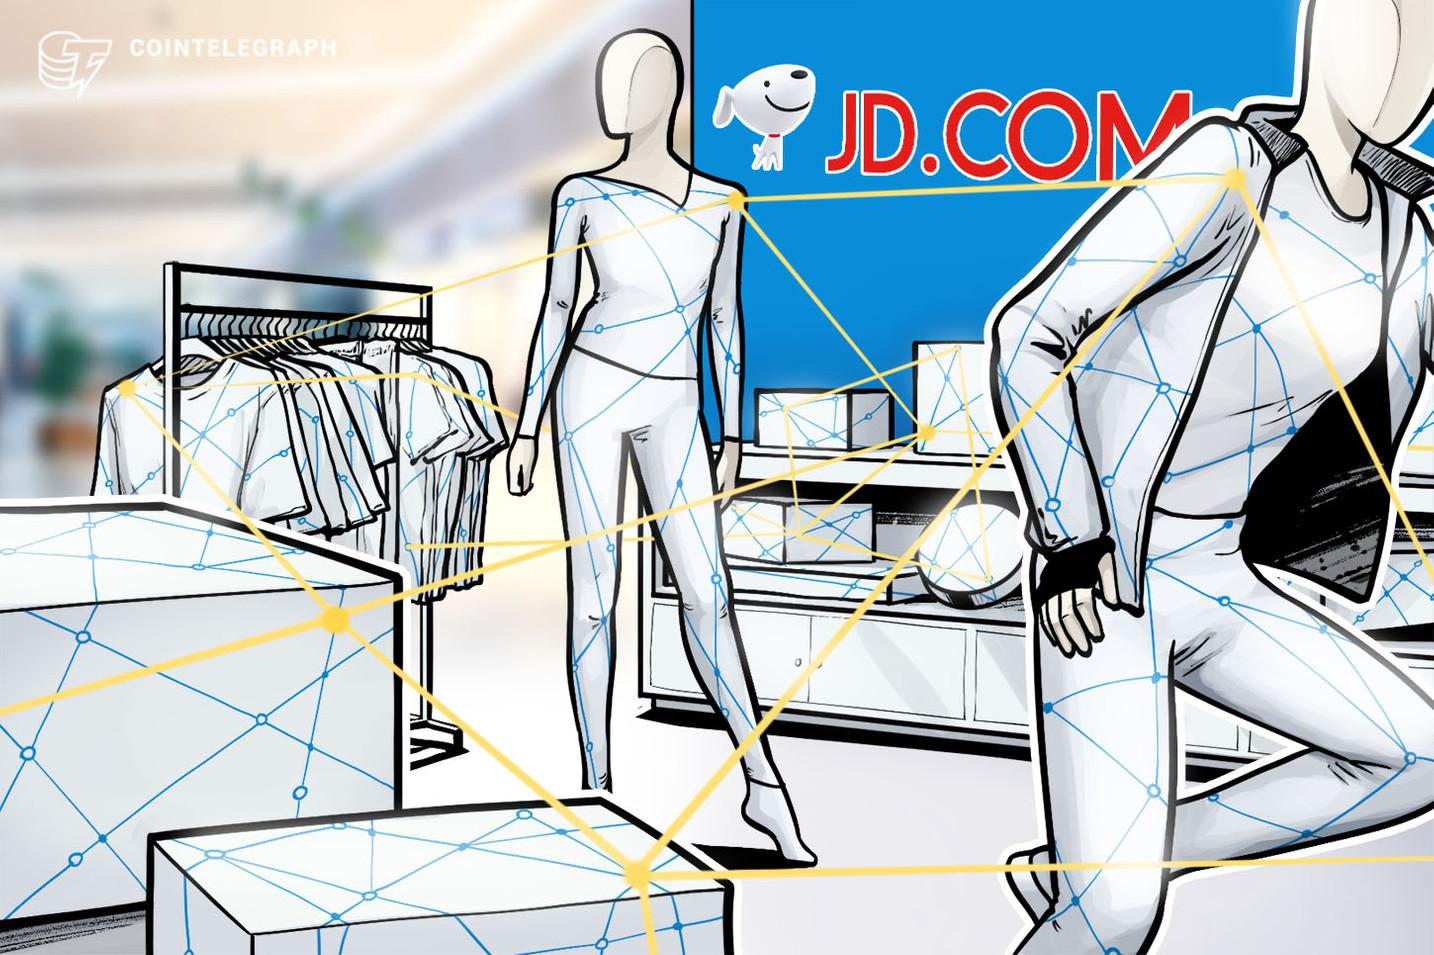 El gigante minorista chino JD.com lanza Enterprise Blockchain-as-a-Service.